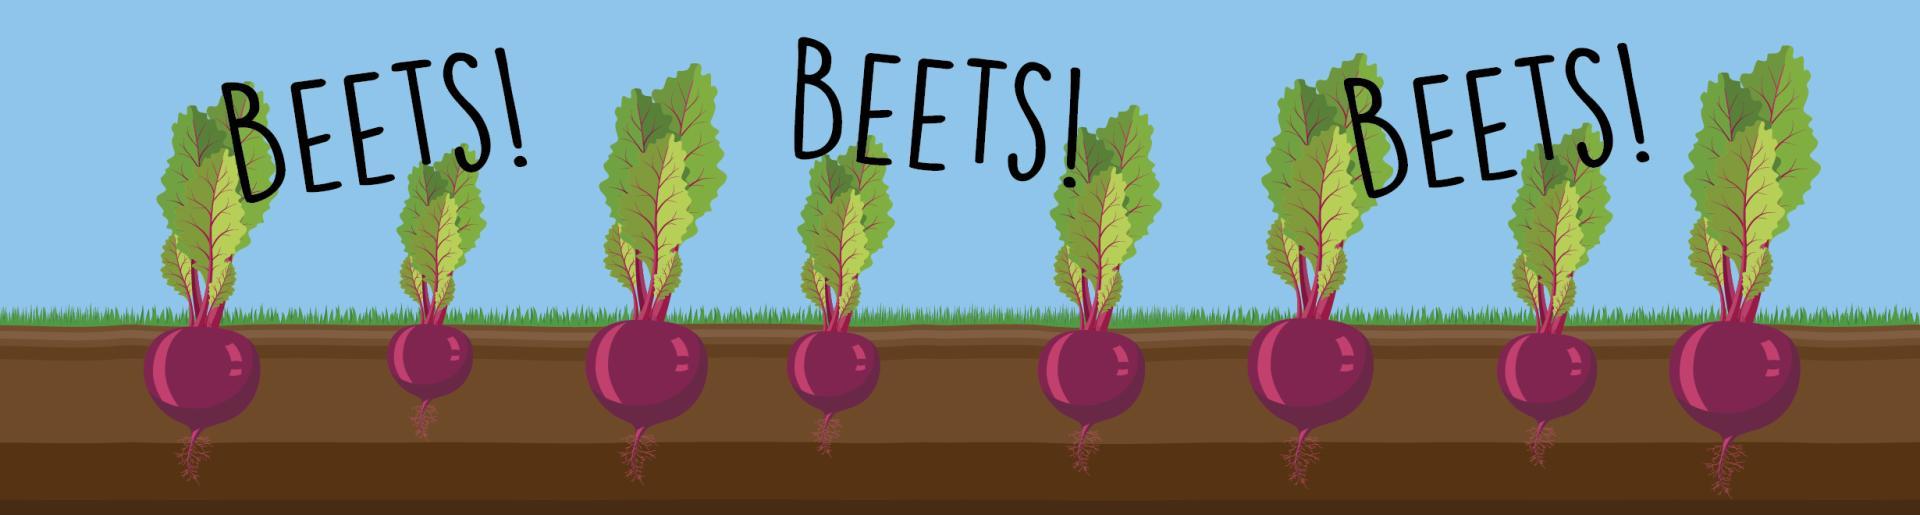 Beets, Beets, Beets